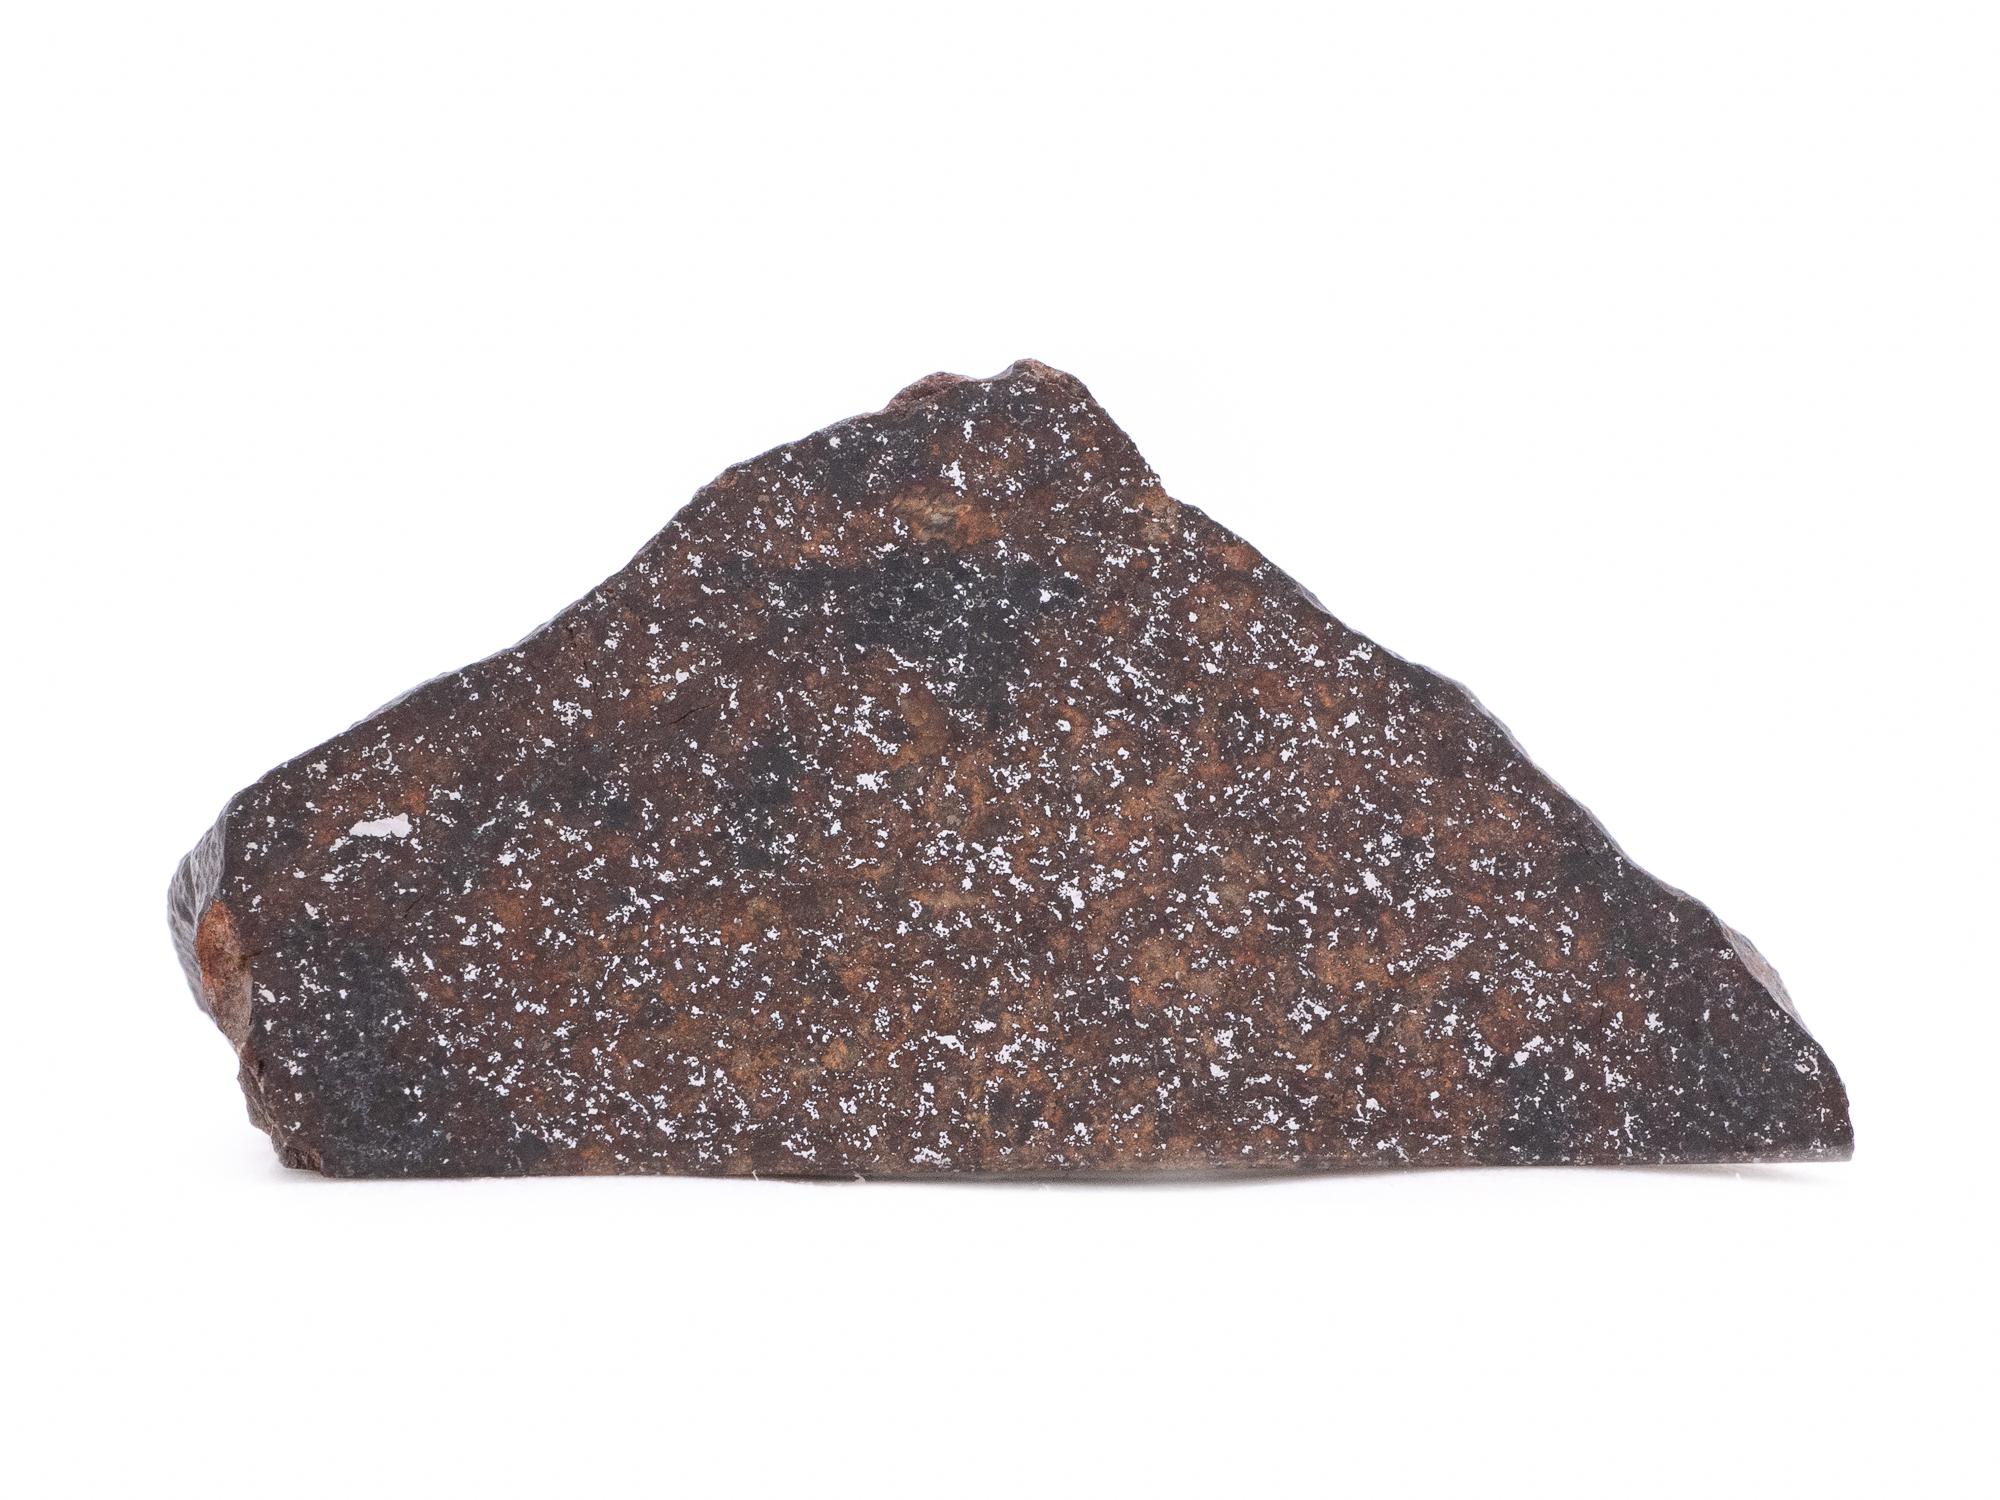 stone meteorite 68